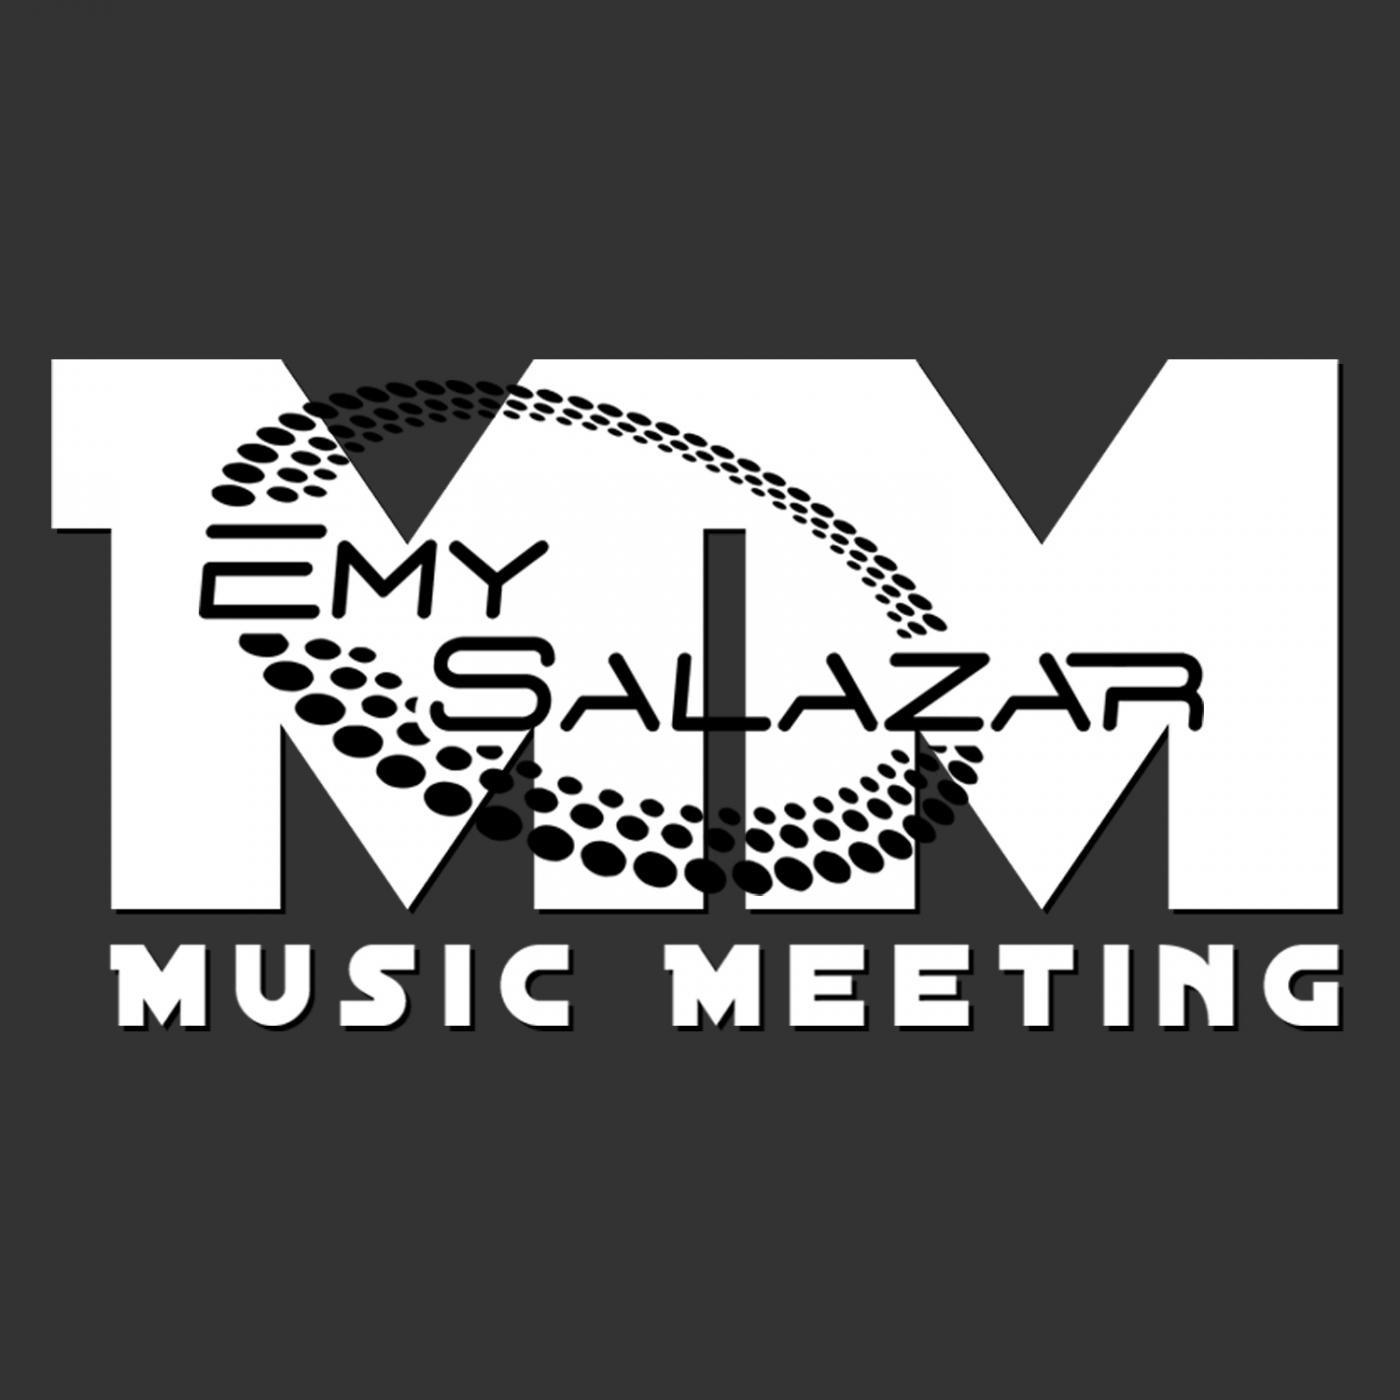 <![CDATA[Music Meeting]]>